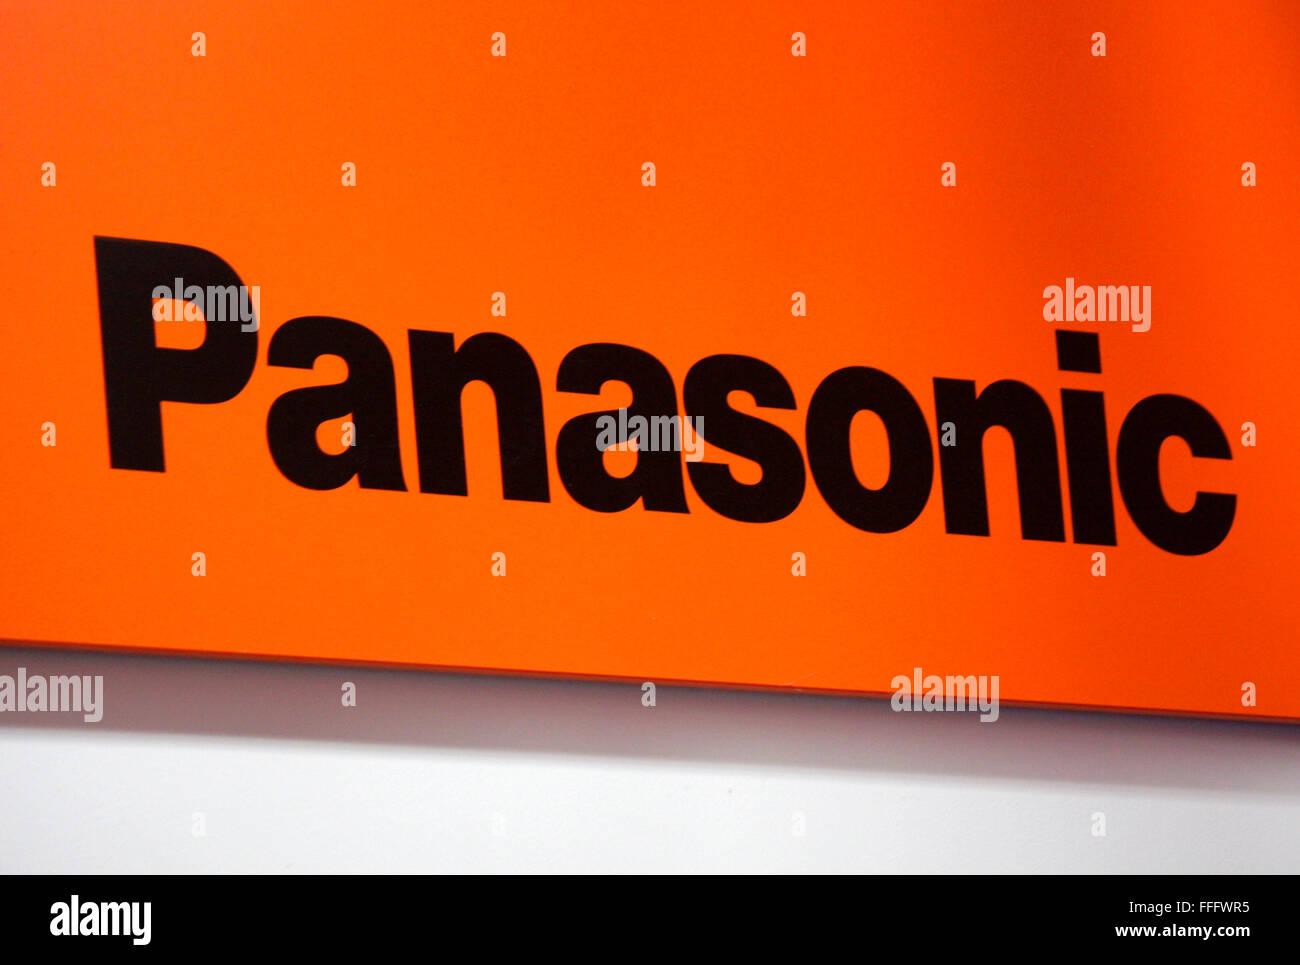 Markenname: 'Panasonic', Dezember 2013, Berlin. - Stock Image